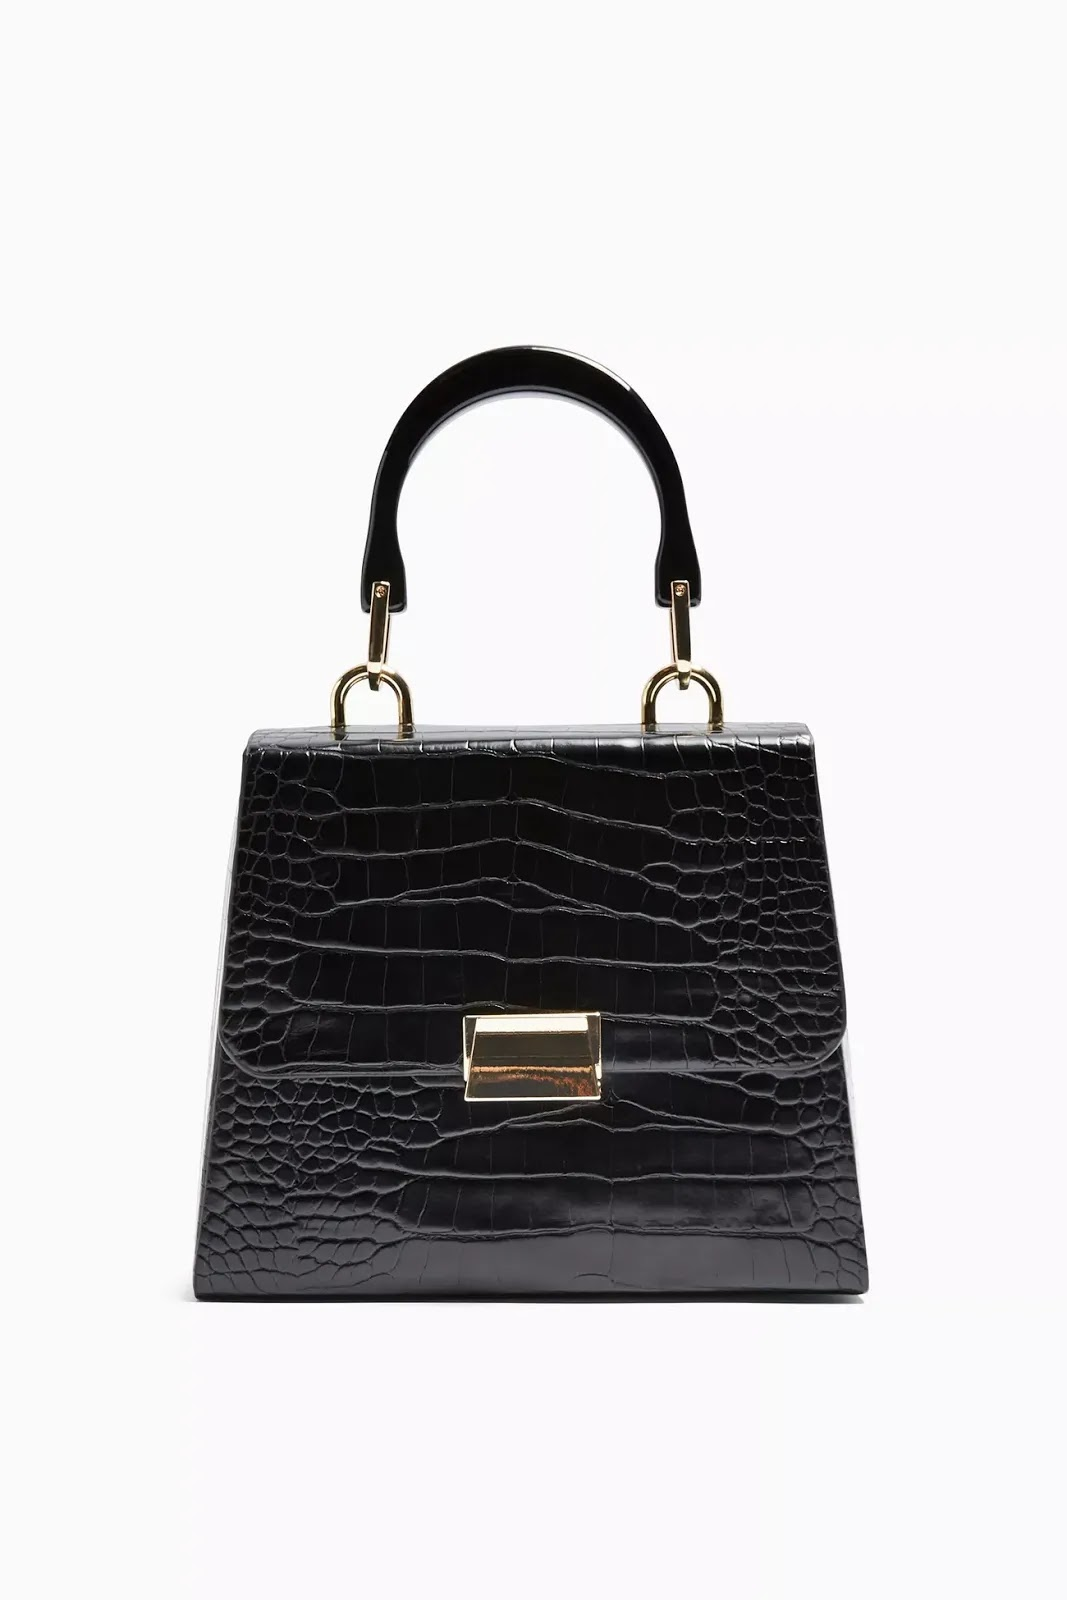 VINTAGE Black Crocodile Grab Bag